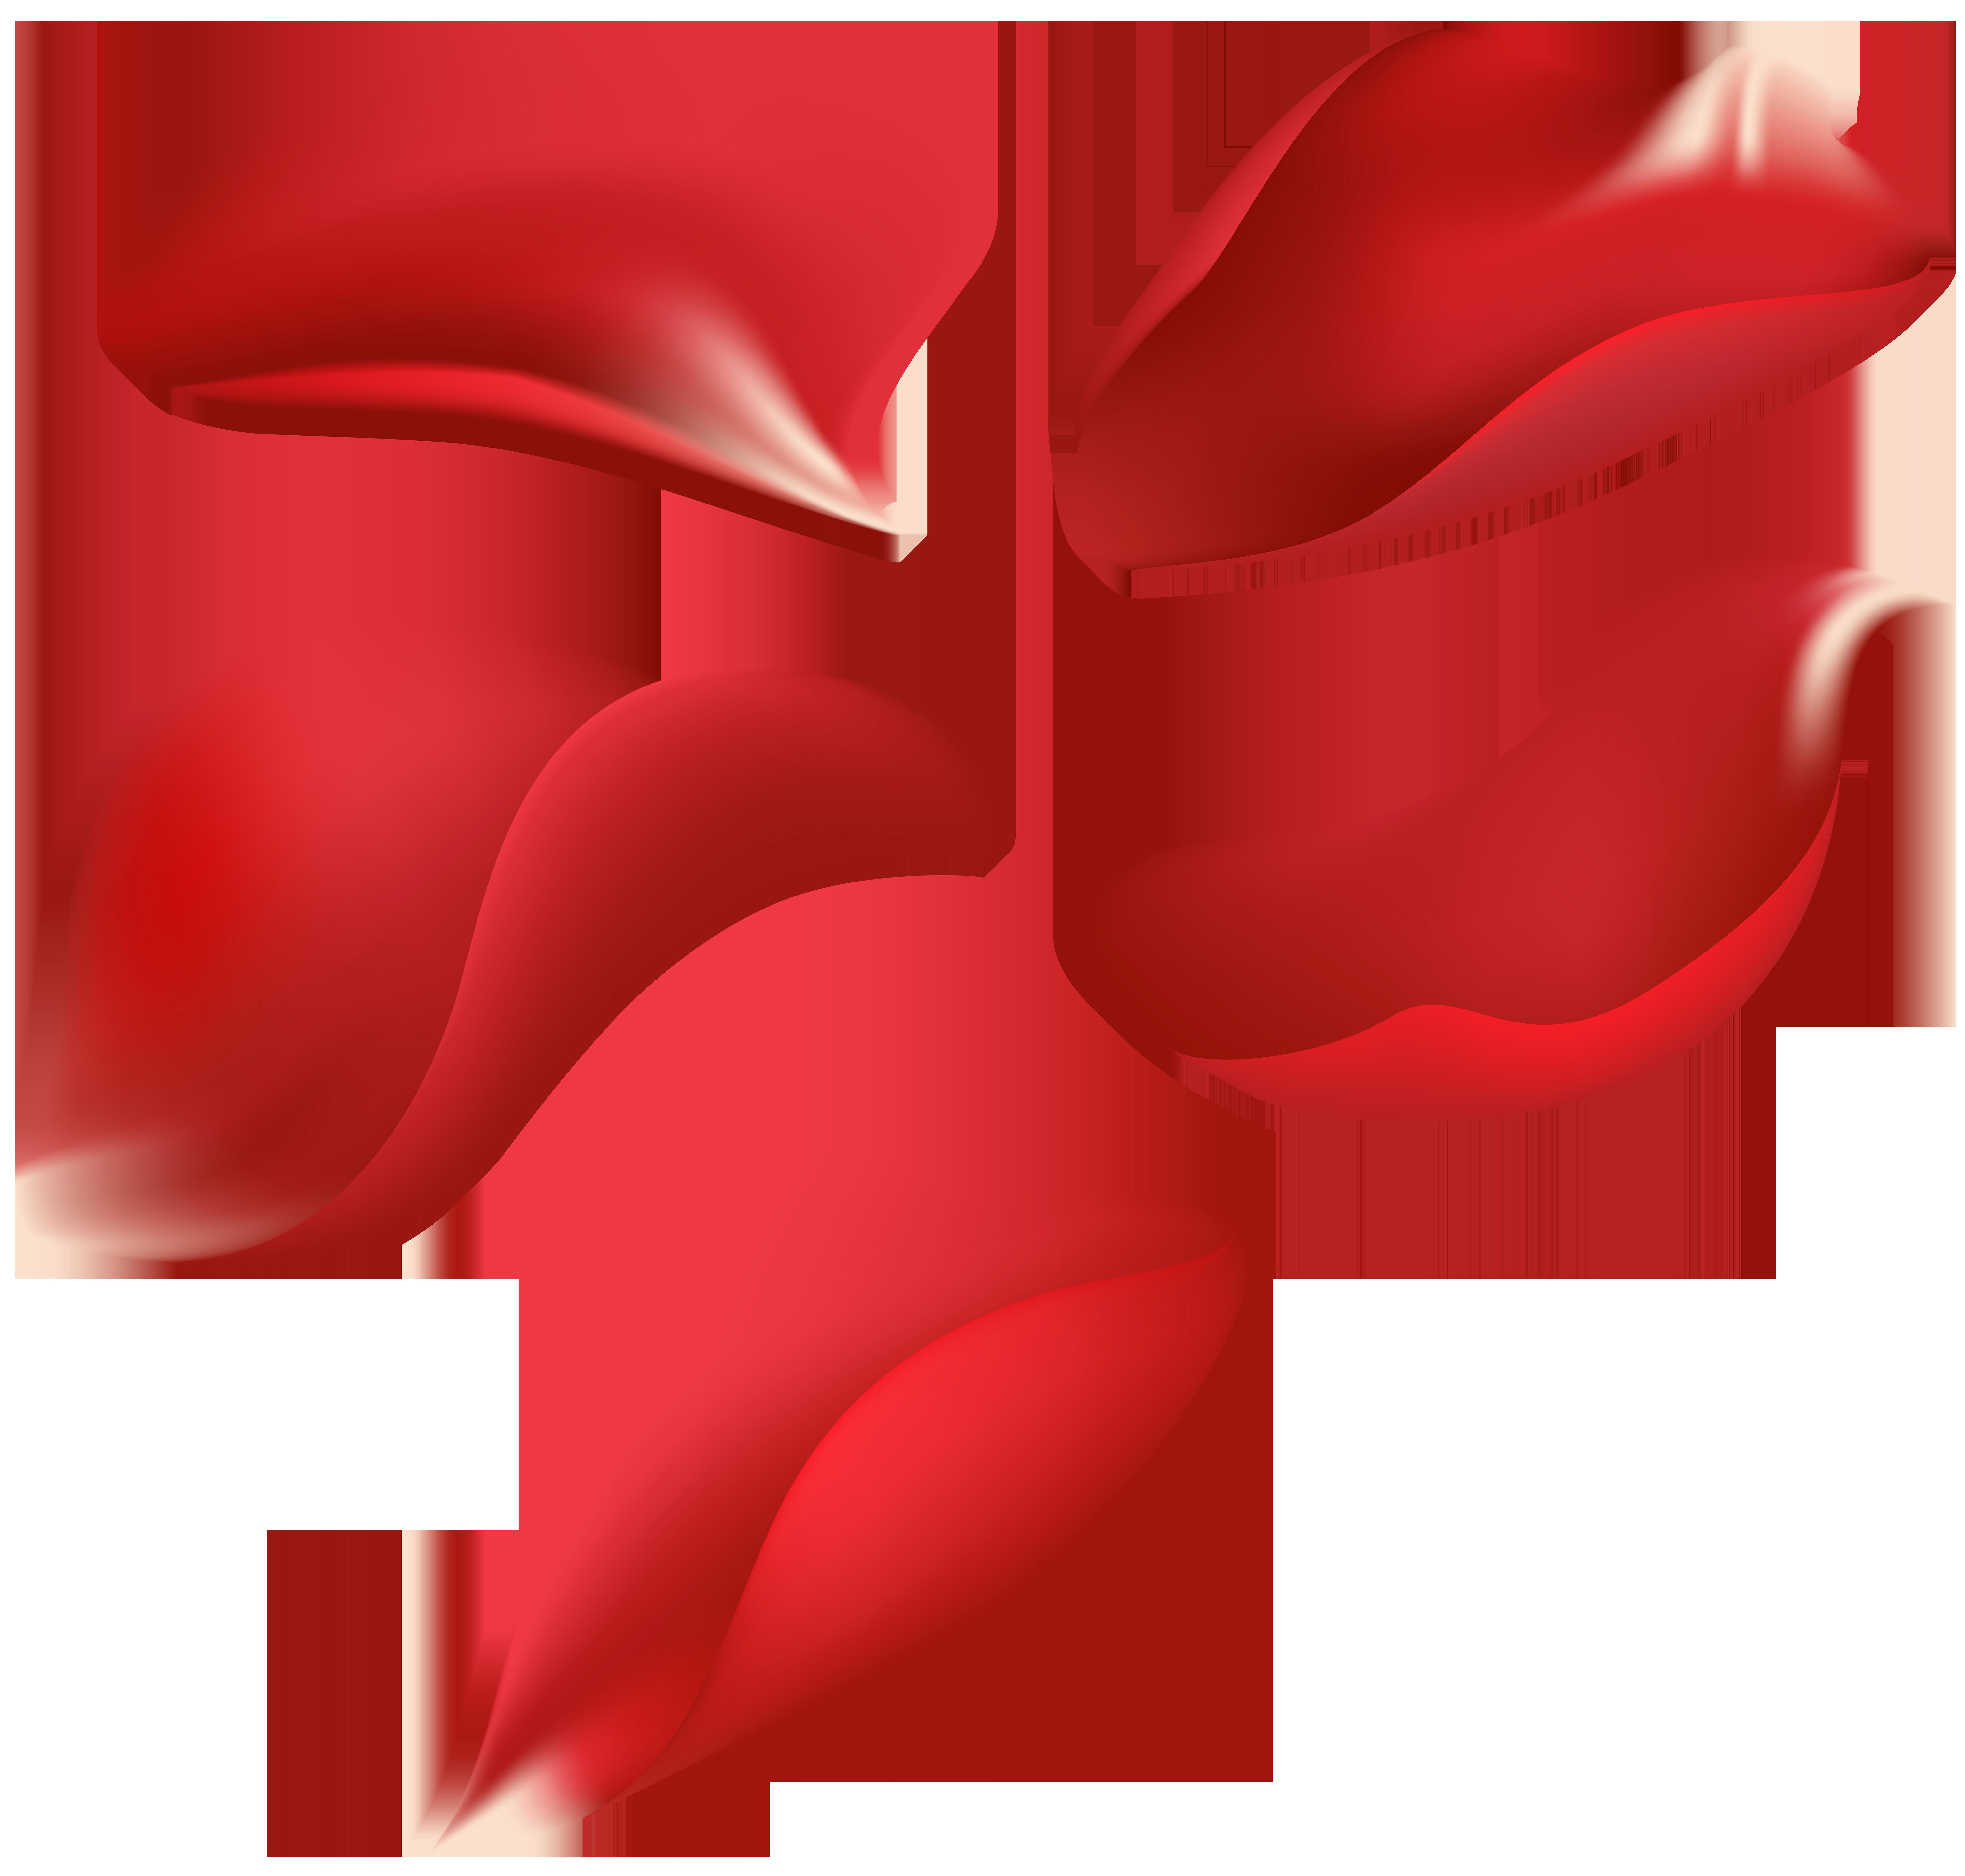 Red Rose Petals Transparent Clip Art Image.